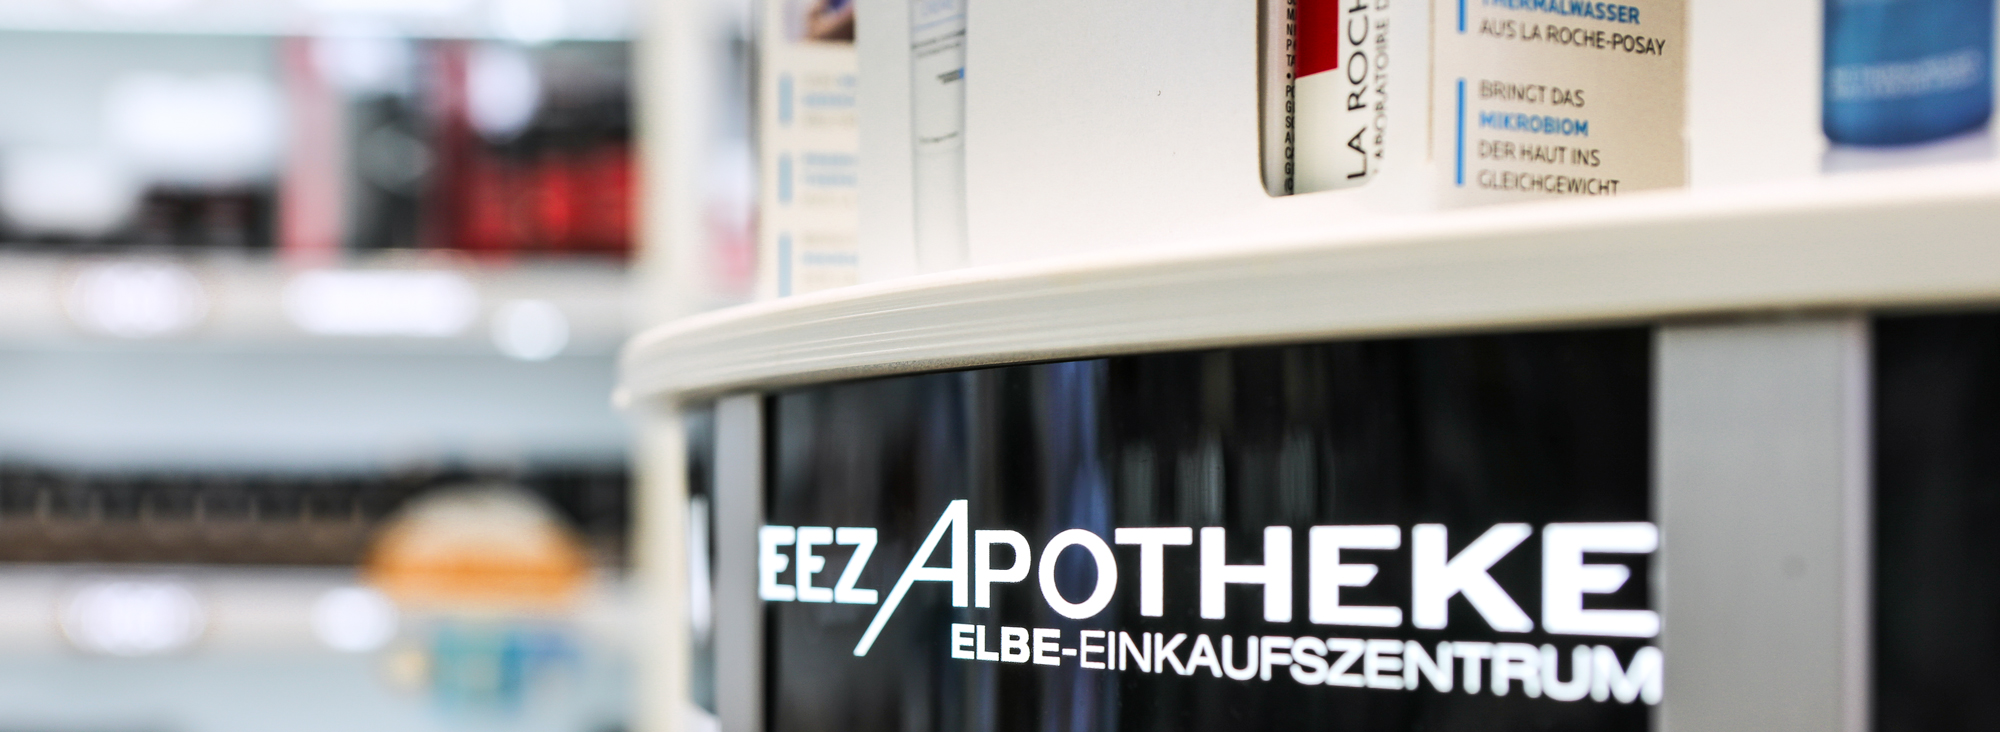 EEZ-Apotheke-Header-Partientenkarte